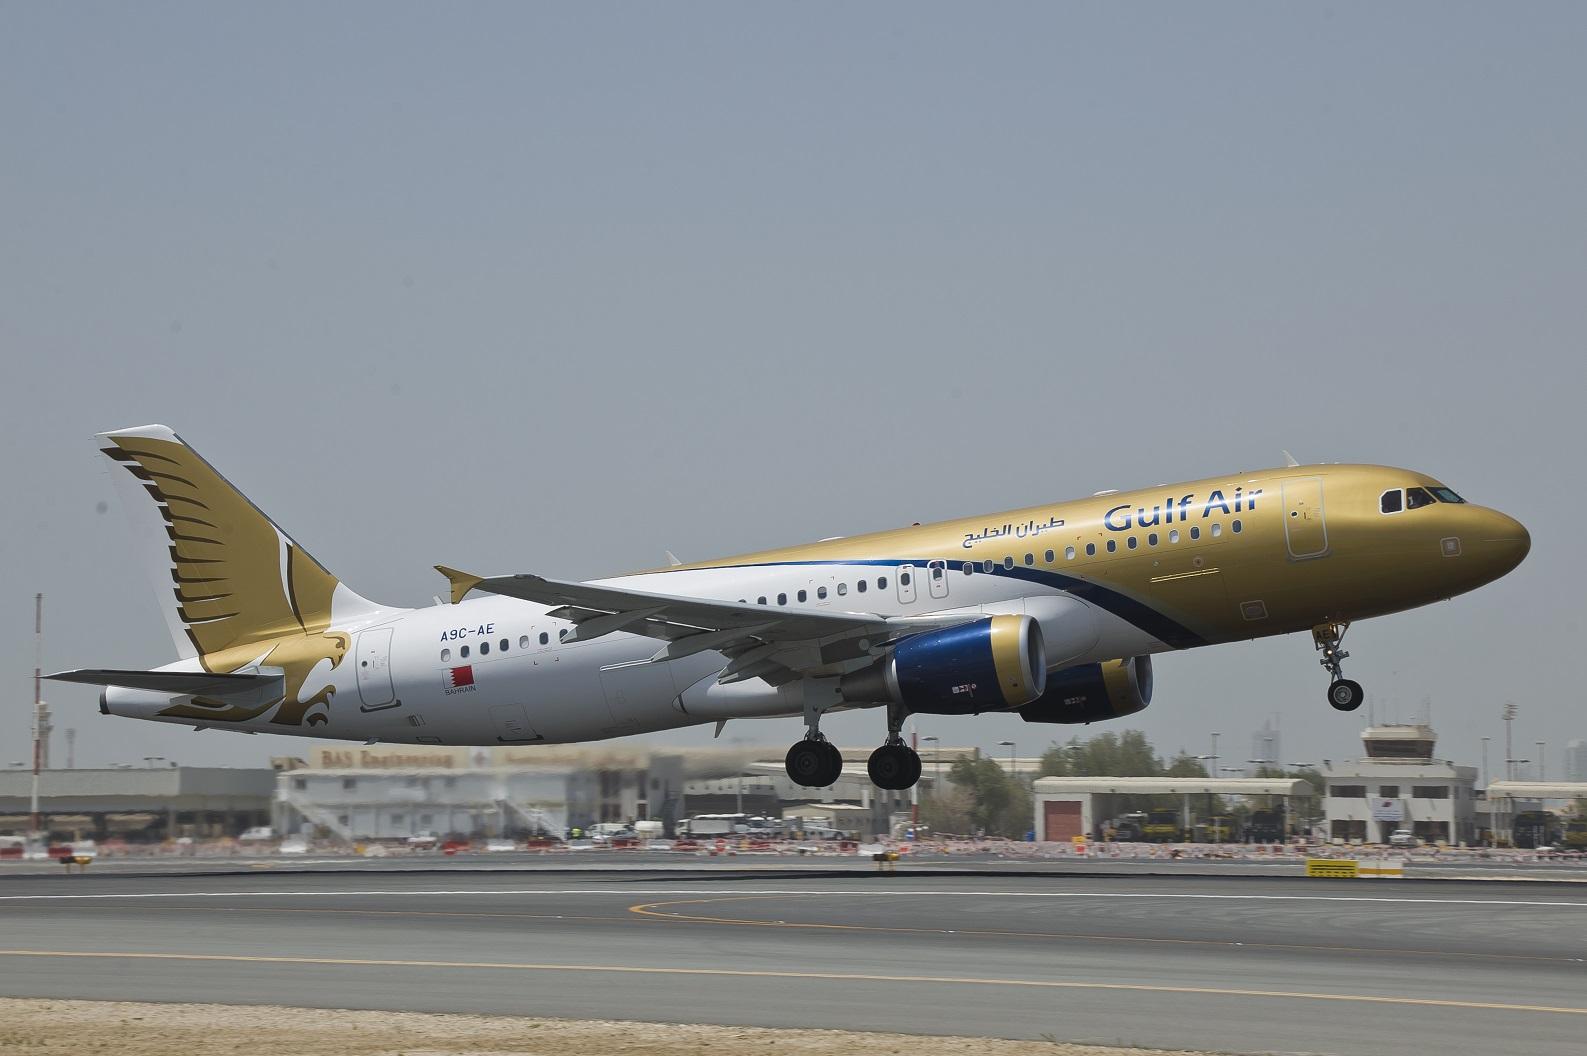 9555b50b91f7b أطلقت طيران الخليج – الناقلة الوطنية لمملكة البحرين – حملتها الترويجية